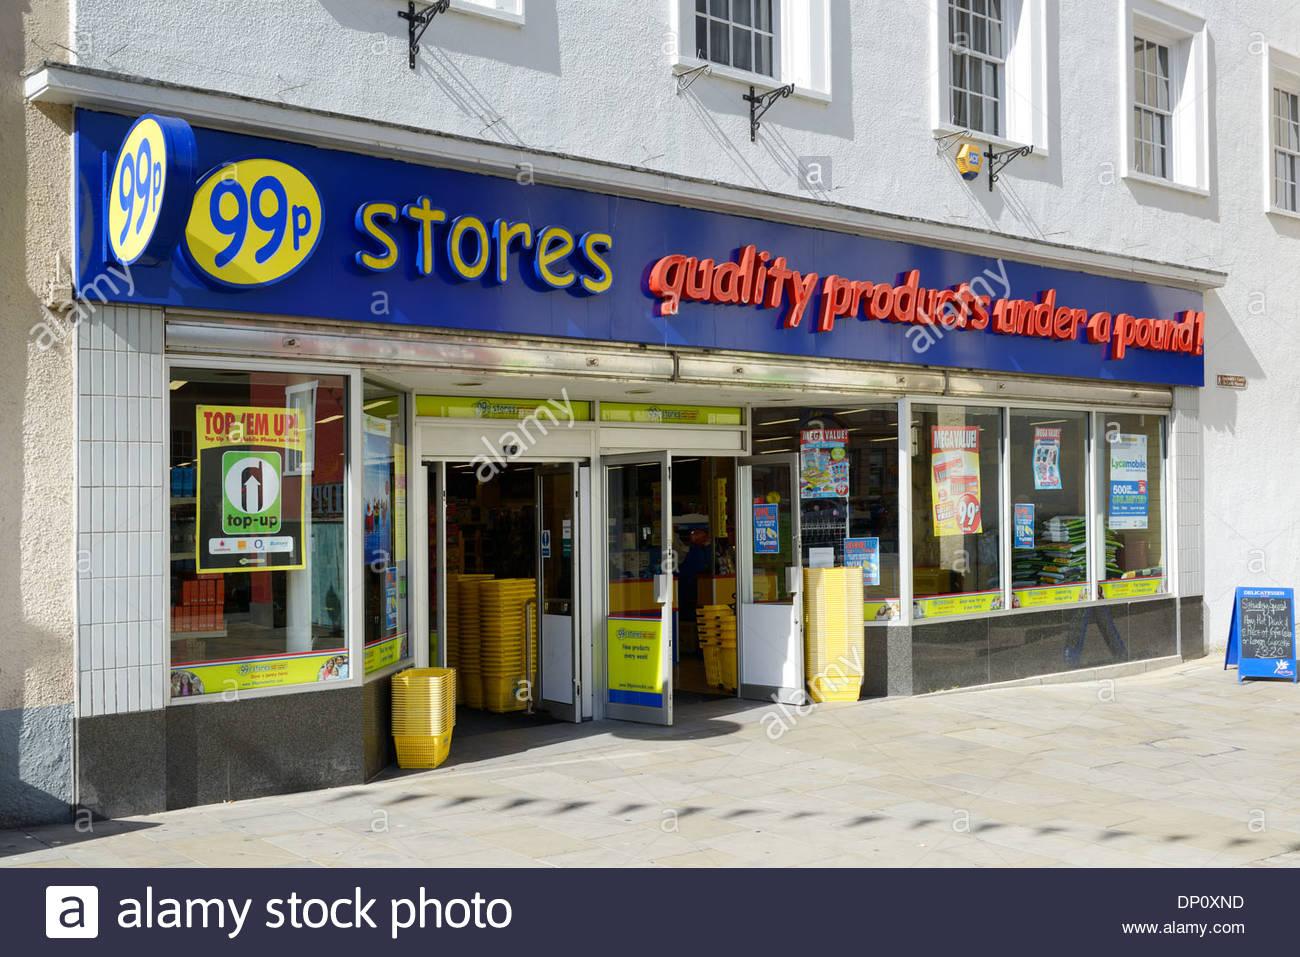 99p Shop, Castle Back, Haverfordwest, Dyfed, Wales UK - Stock Image